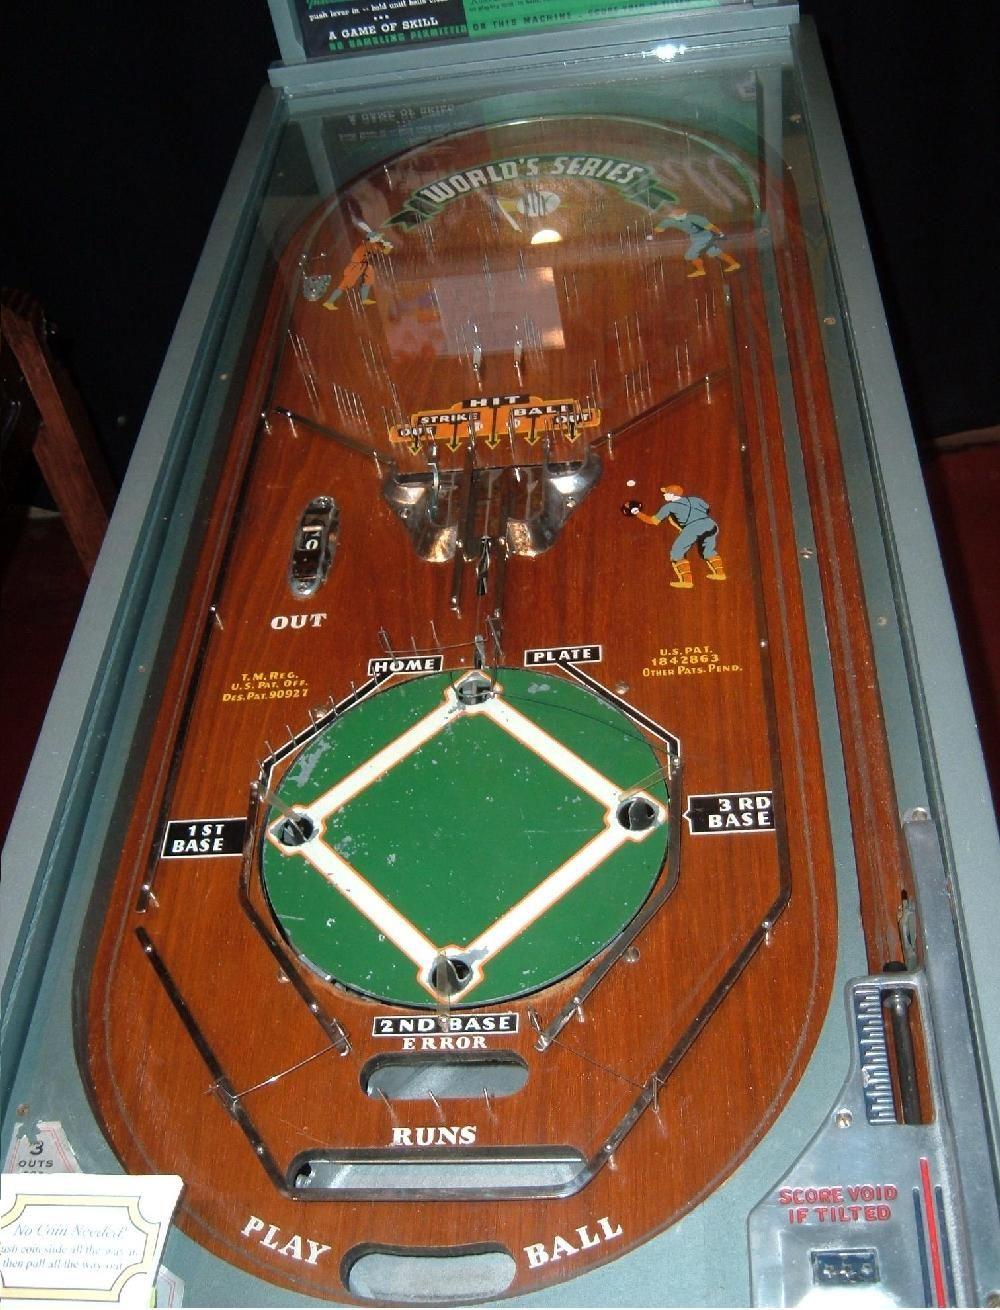 1934 Rockola World Series 1934 Play Ball baseball pinball